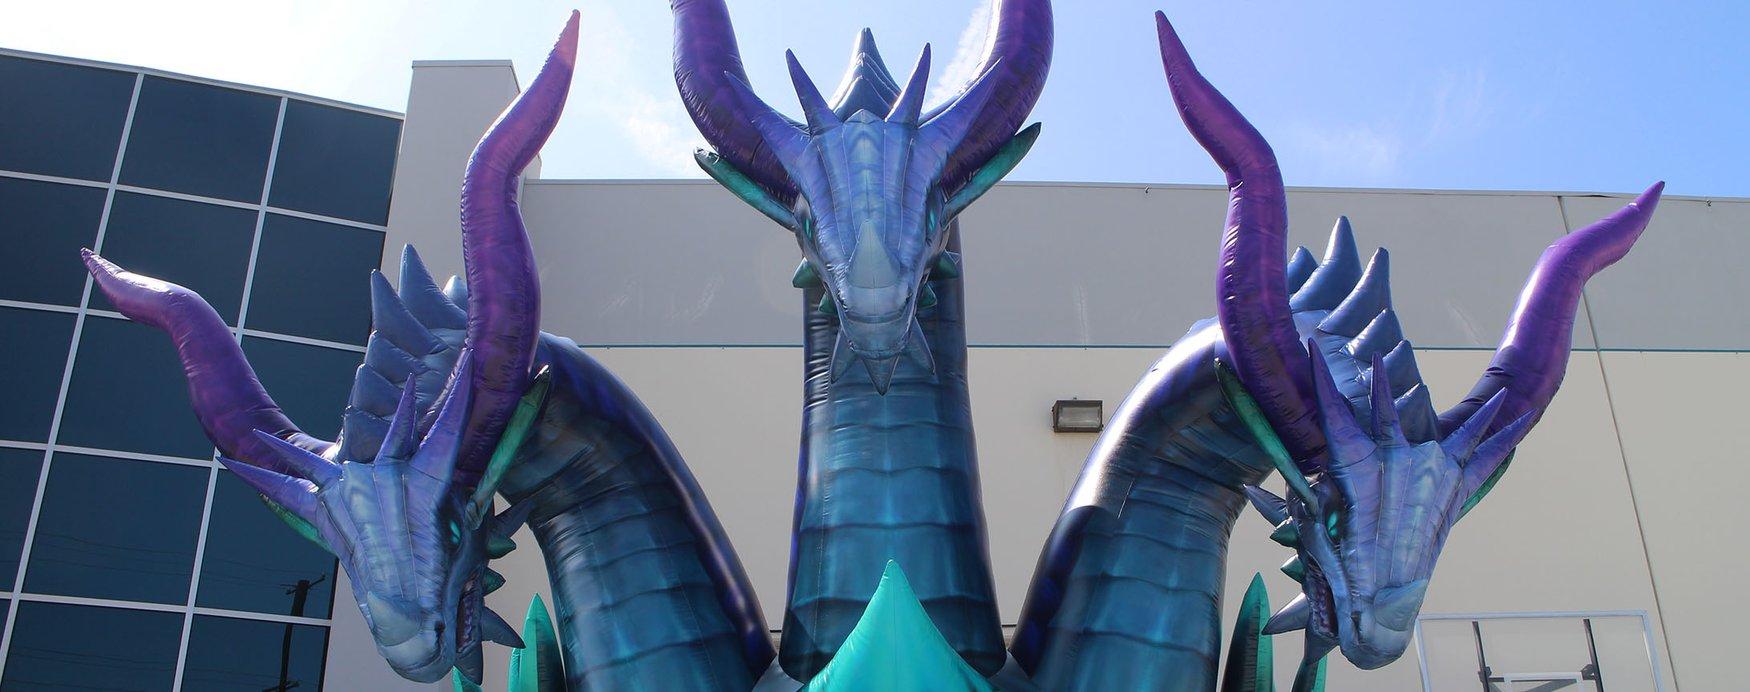 custom-inflatable-dragon-with-three-heads